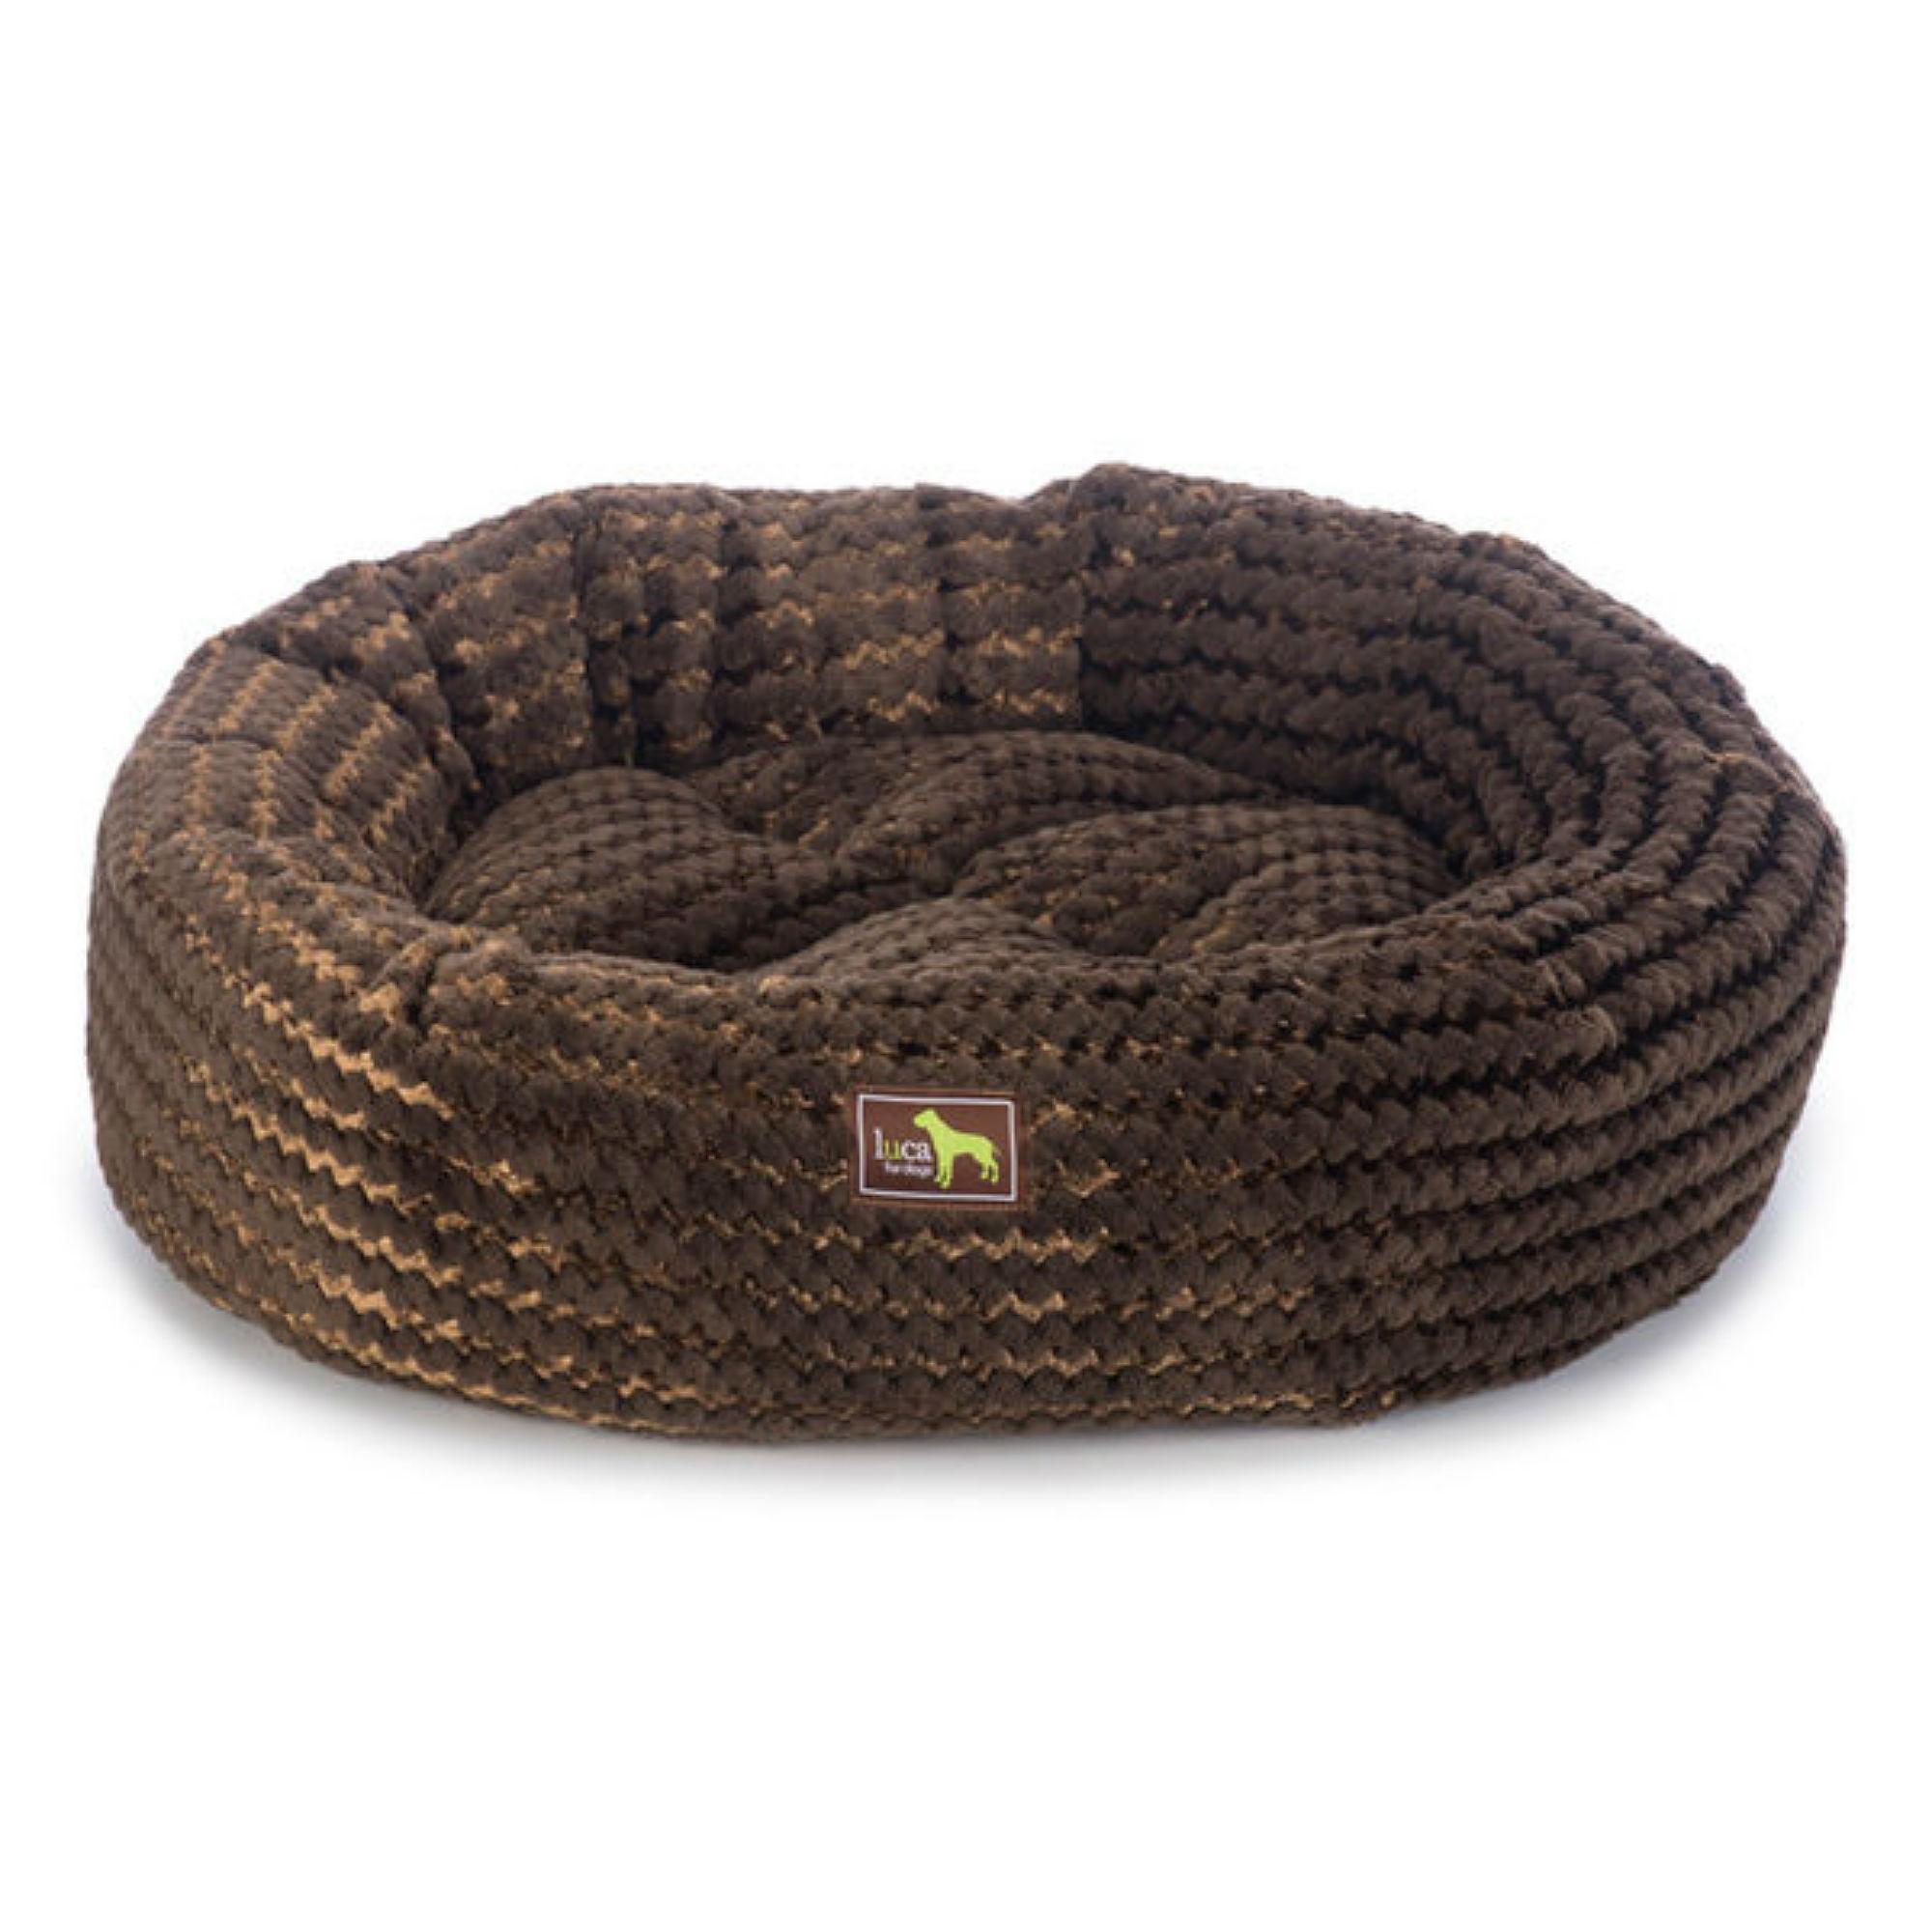 Luca Nest Plush Dog Bed - Chocolate Swirl